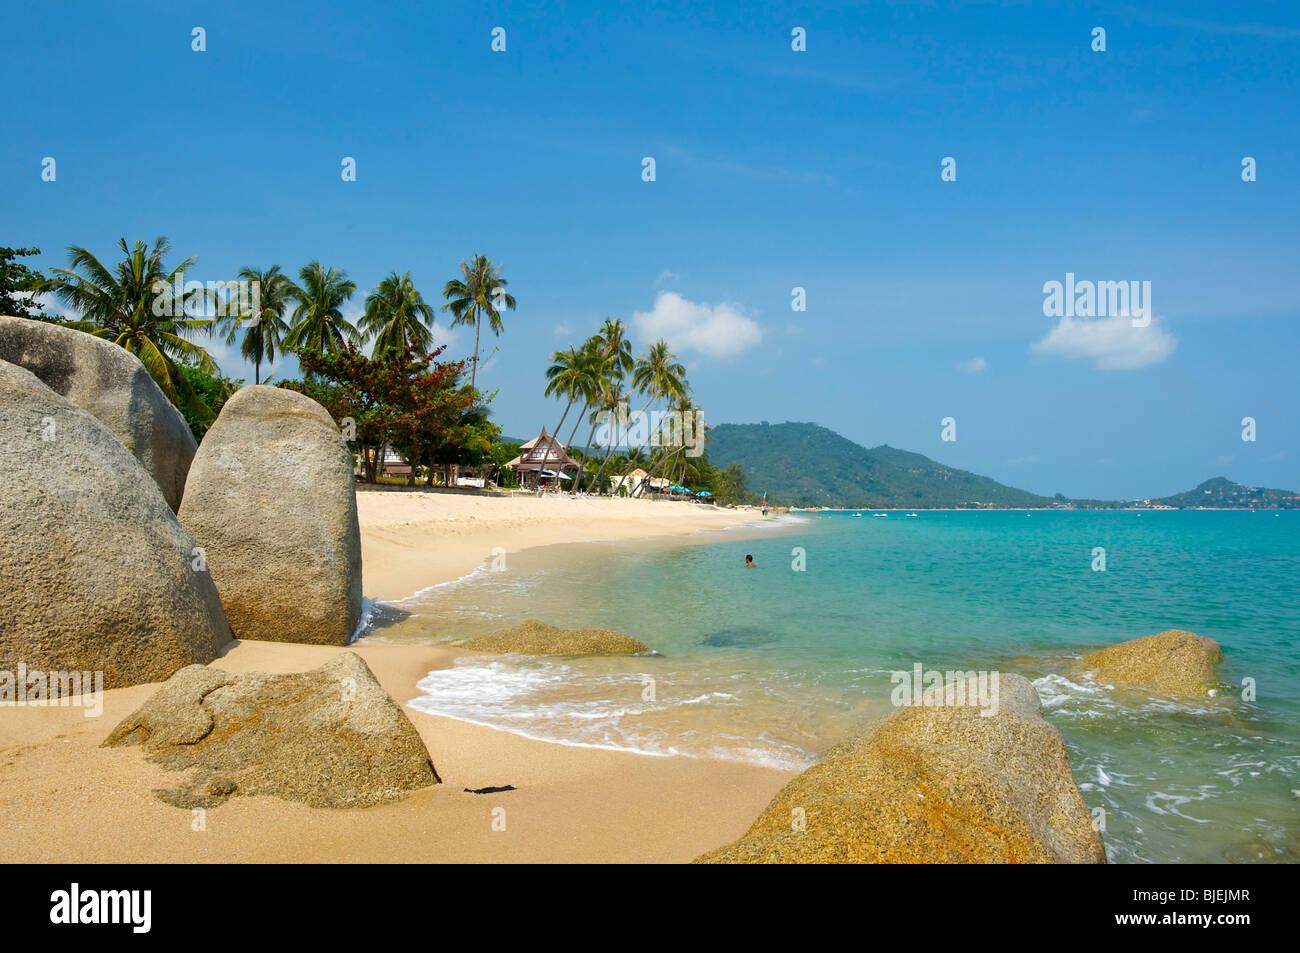 Lamai Beach, Insel Ko Samui, Thailand - Stock Image